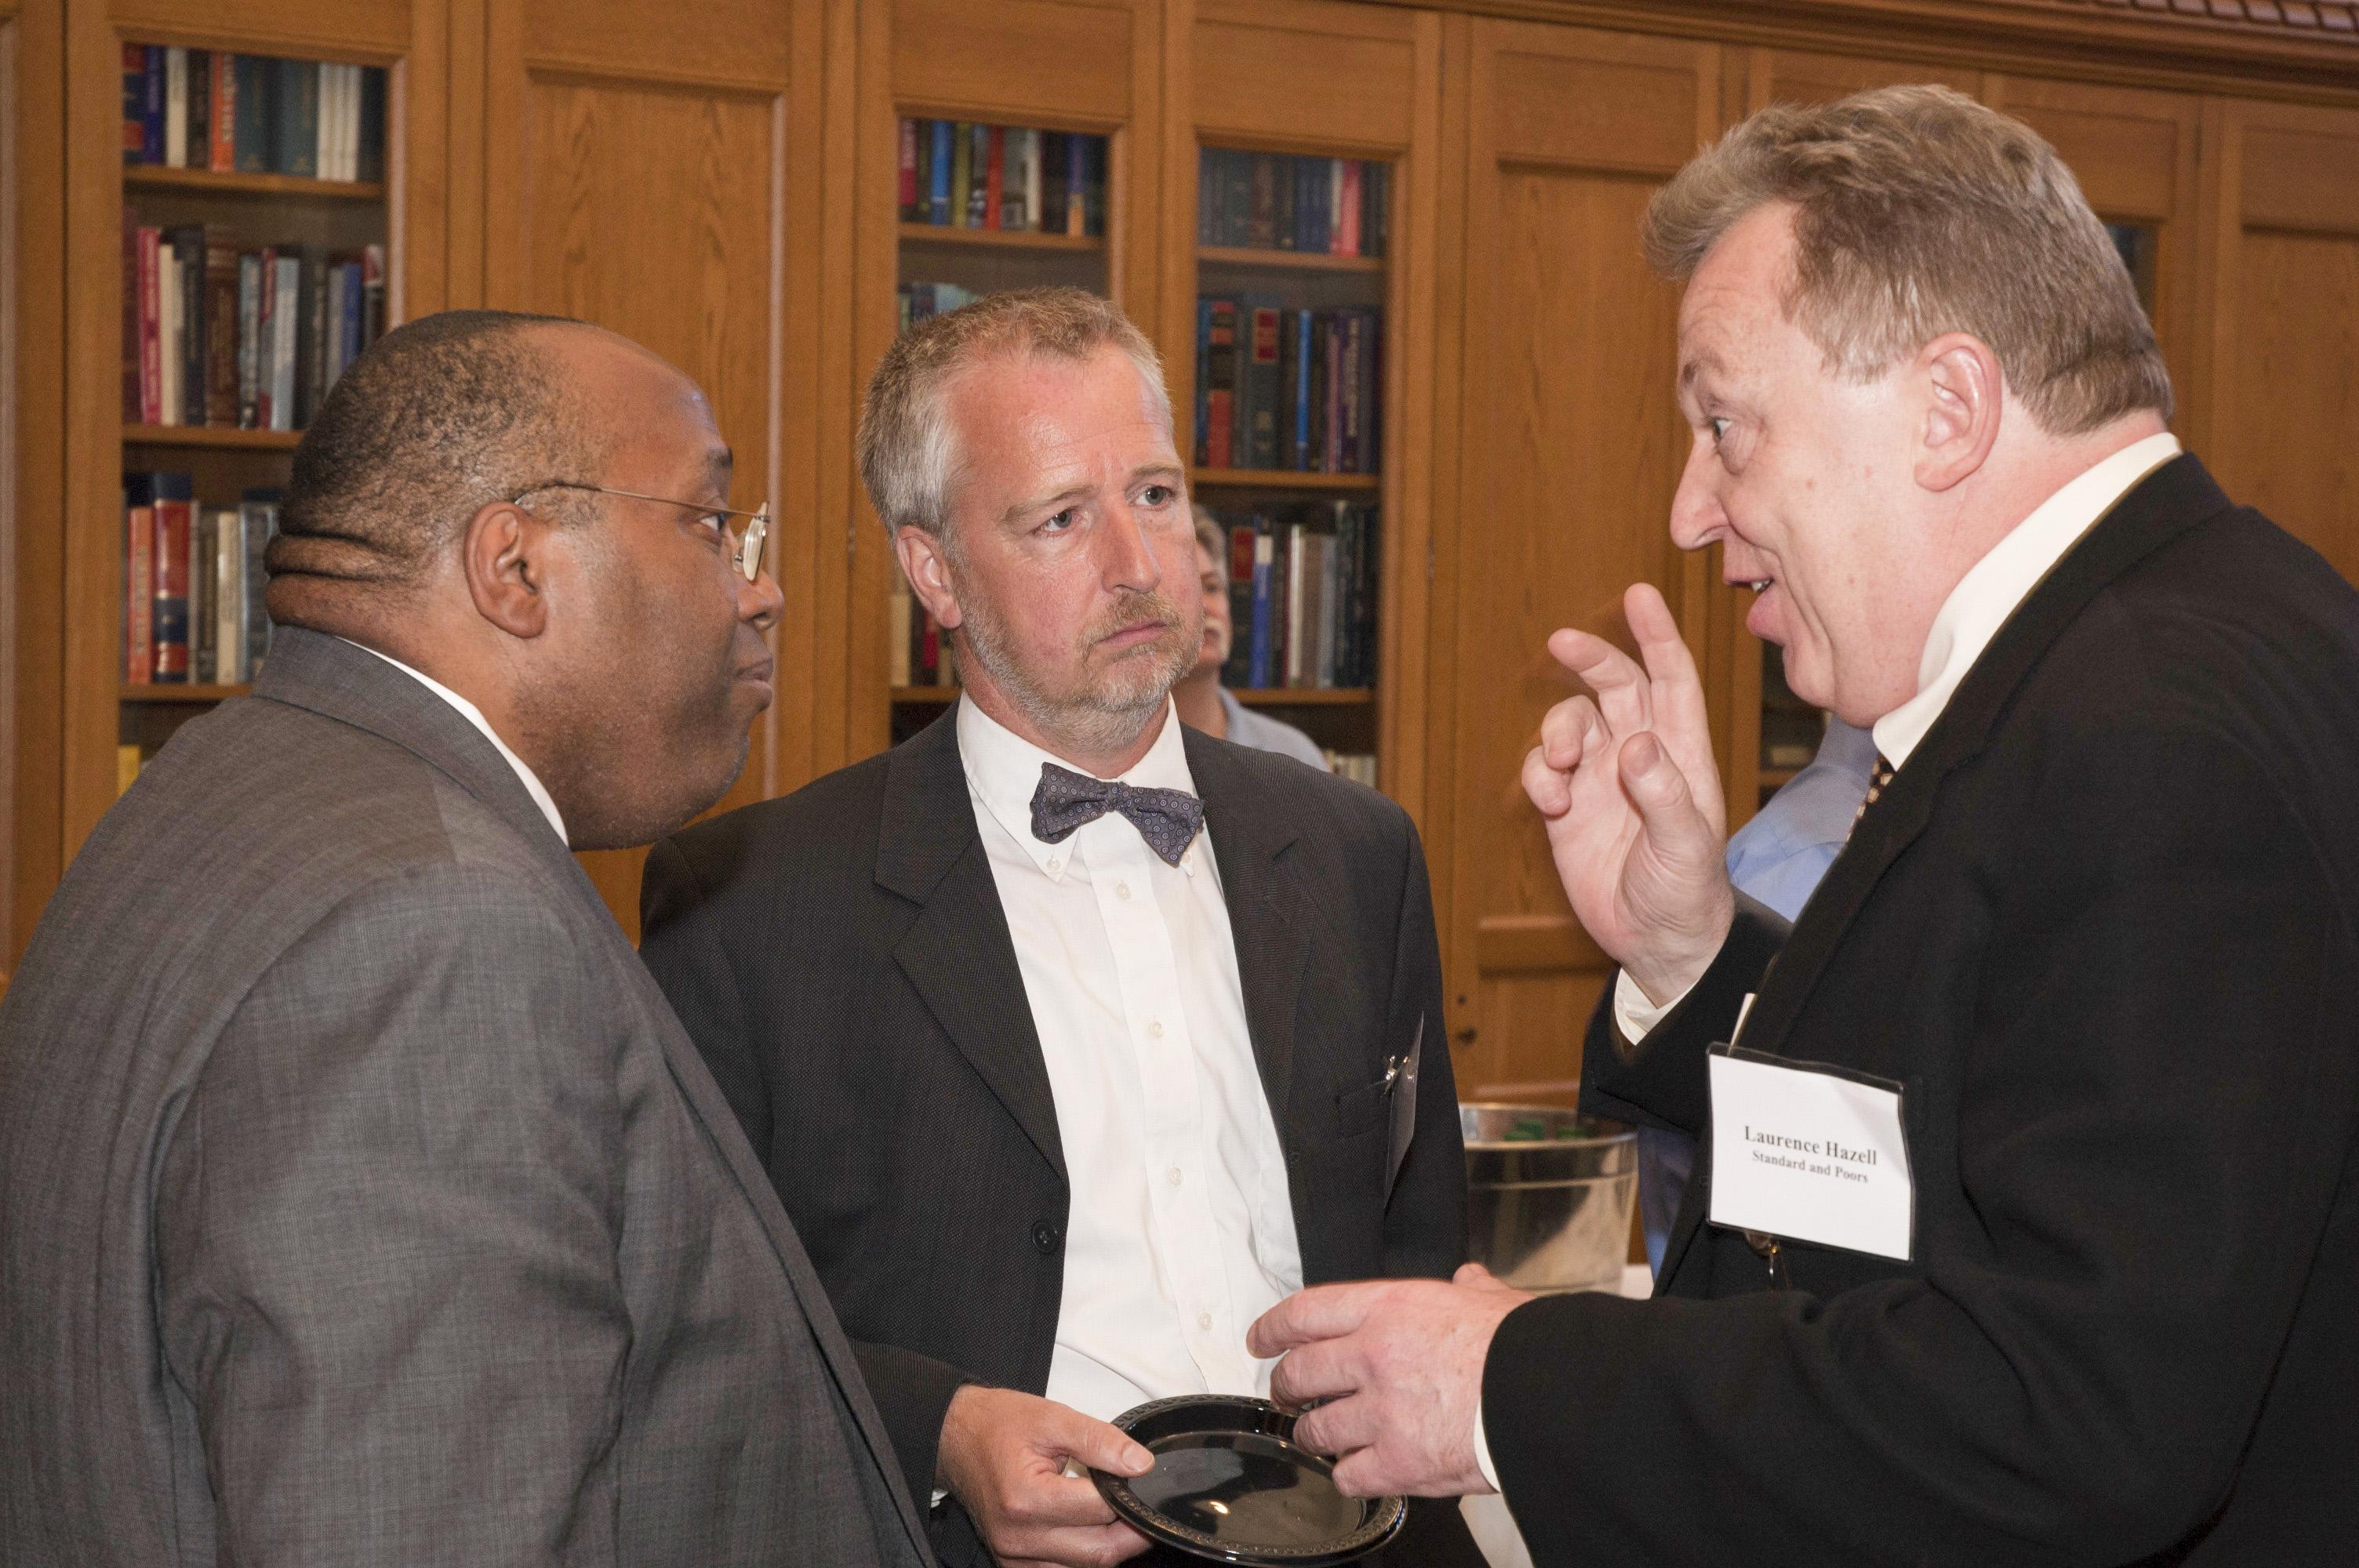 Francis Byrd, Paul Hodgson, and Laurence Hazell